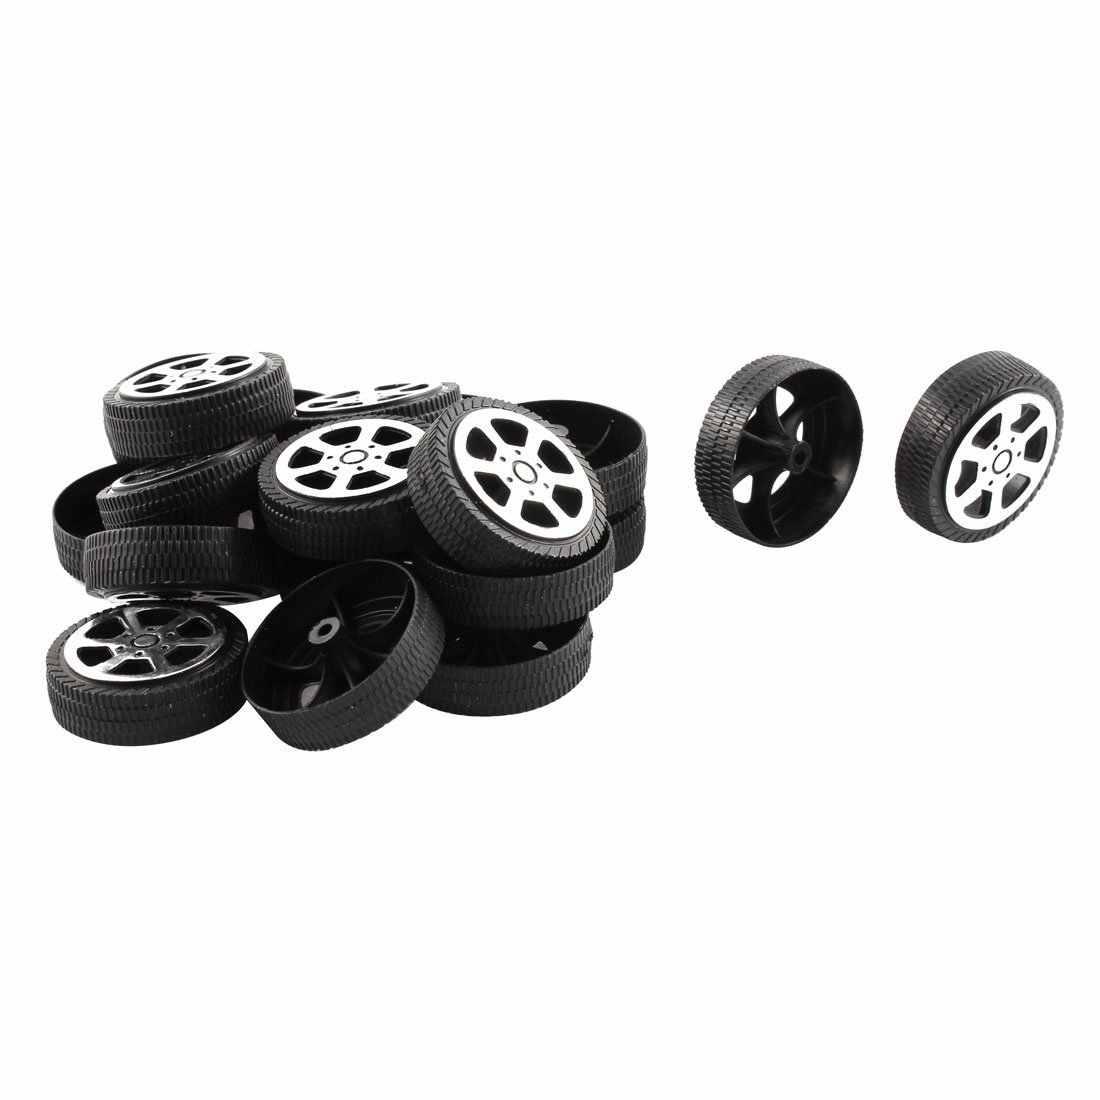 Plastic Roll 2mm Dia Shaft Auto Vrachtwagen Model Speelgoed Wiel 30mm x 9mm 20Pcs